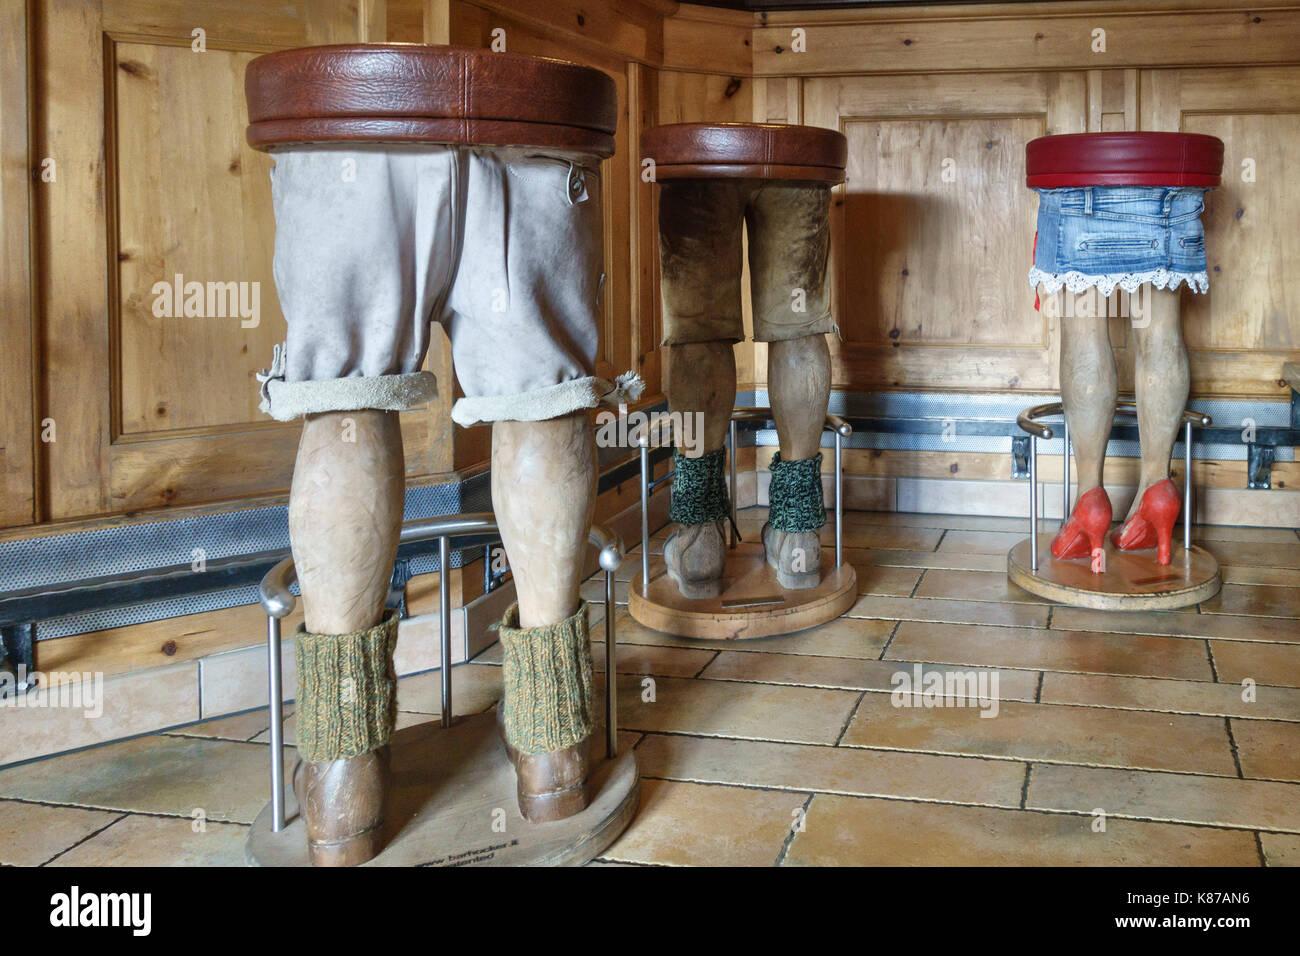 Le dolomiti italia settentrionale inusuale bar sgabelli